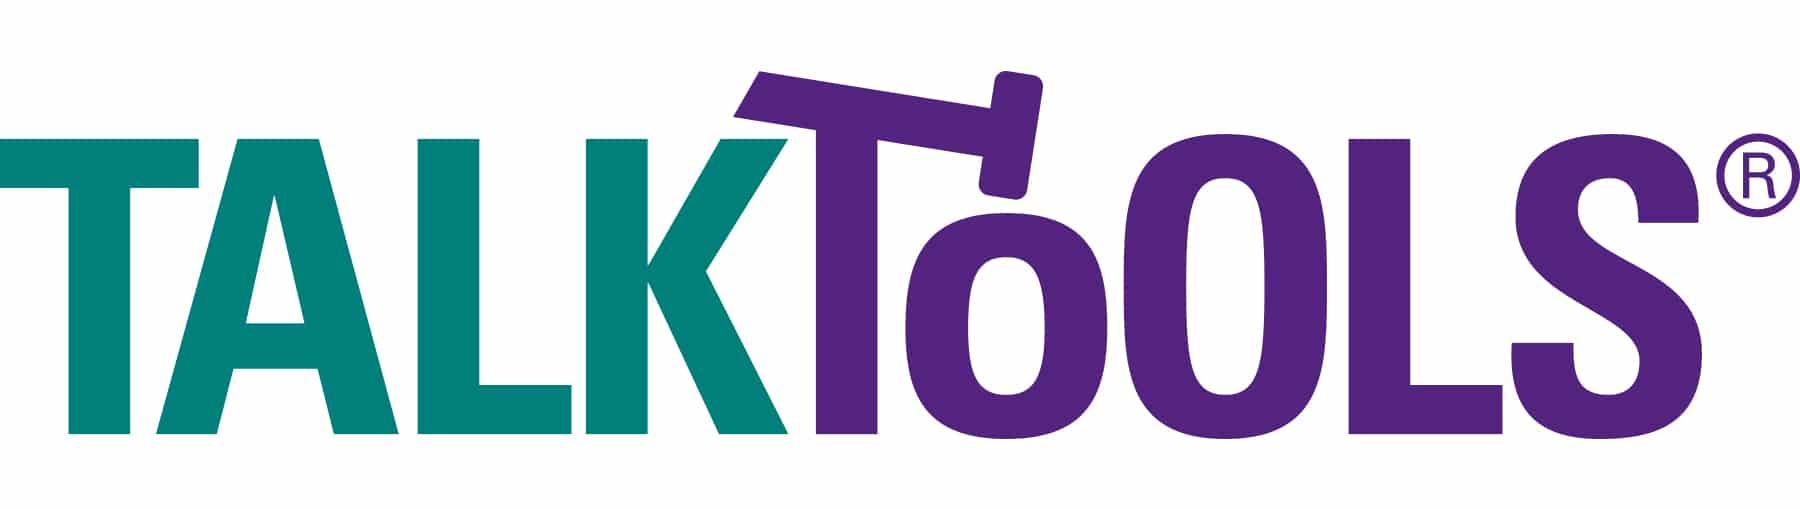 TalkTools-Logo-web.jpg